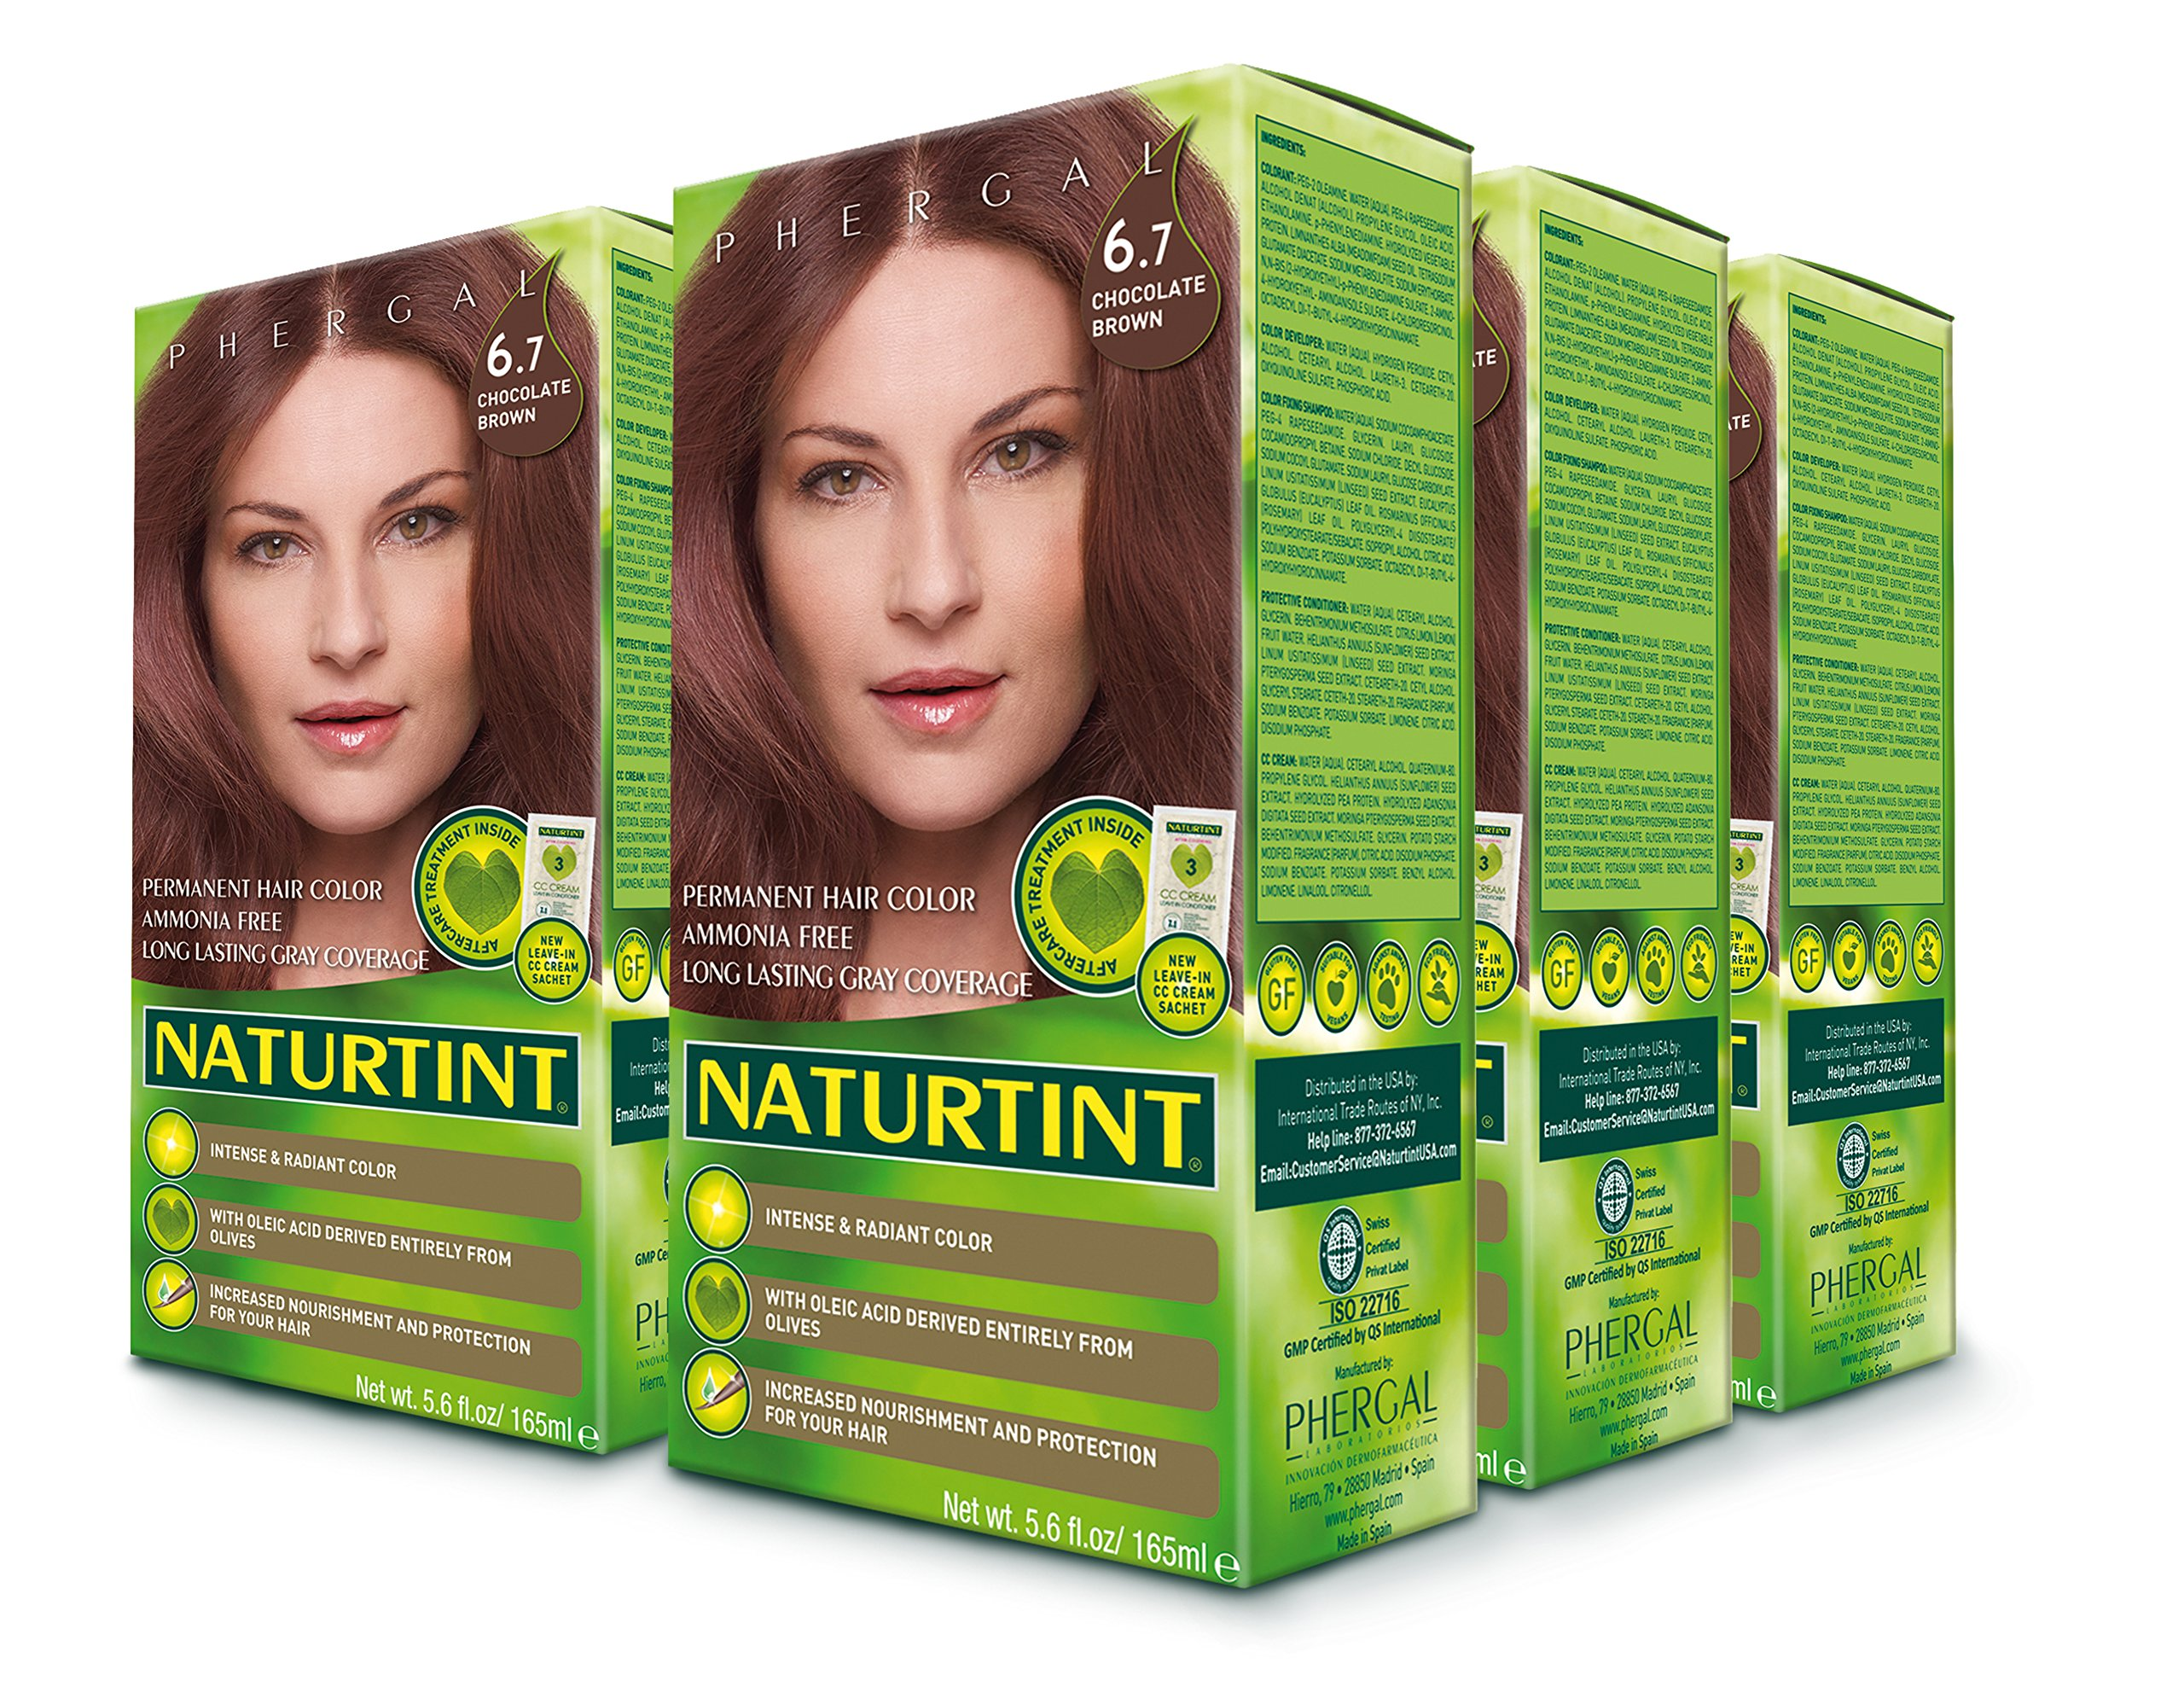 Amazon Naturtint Permanent Hair Color 57 Chocolate Chestnut